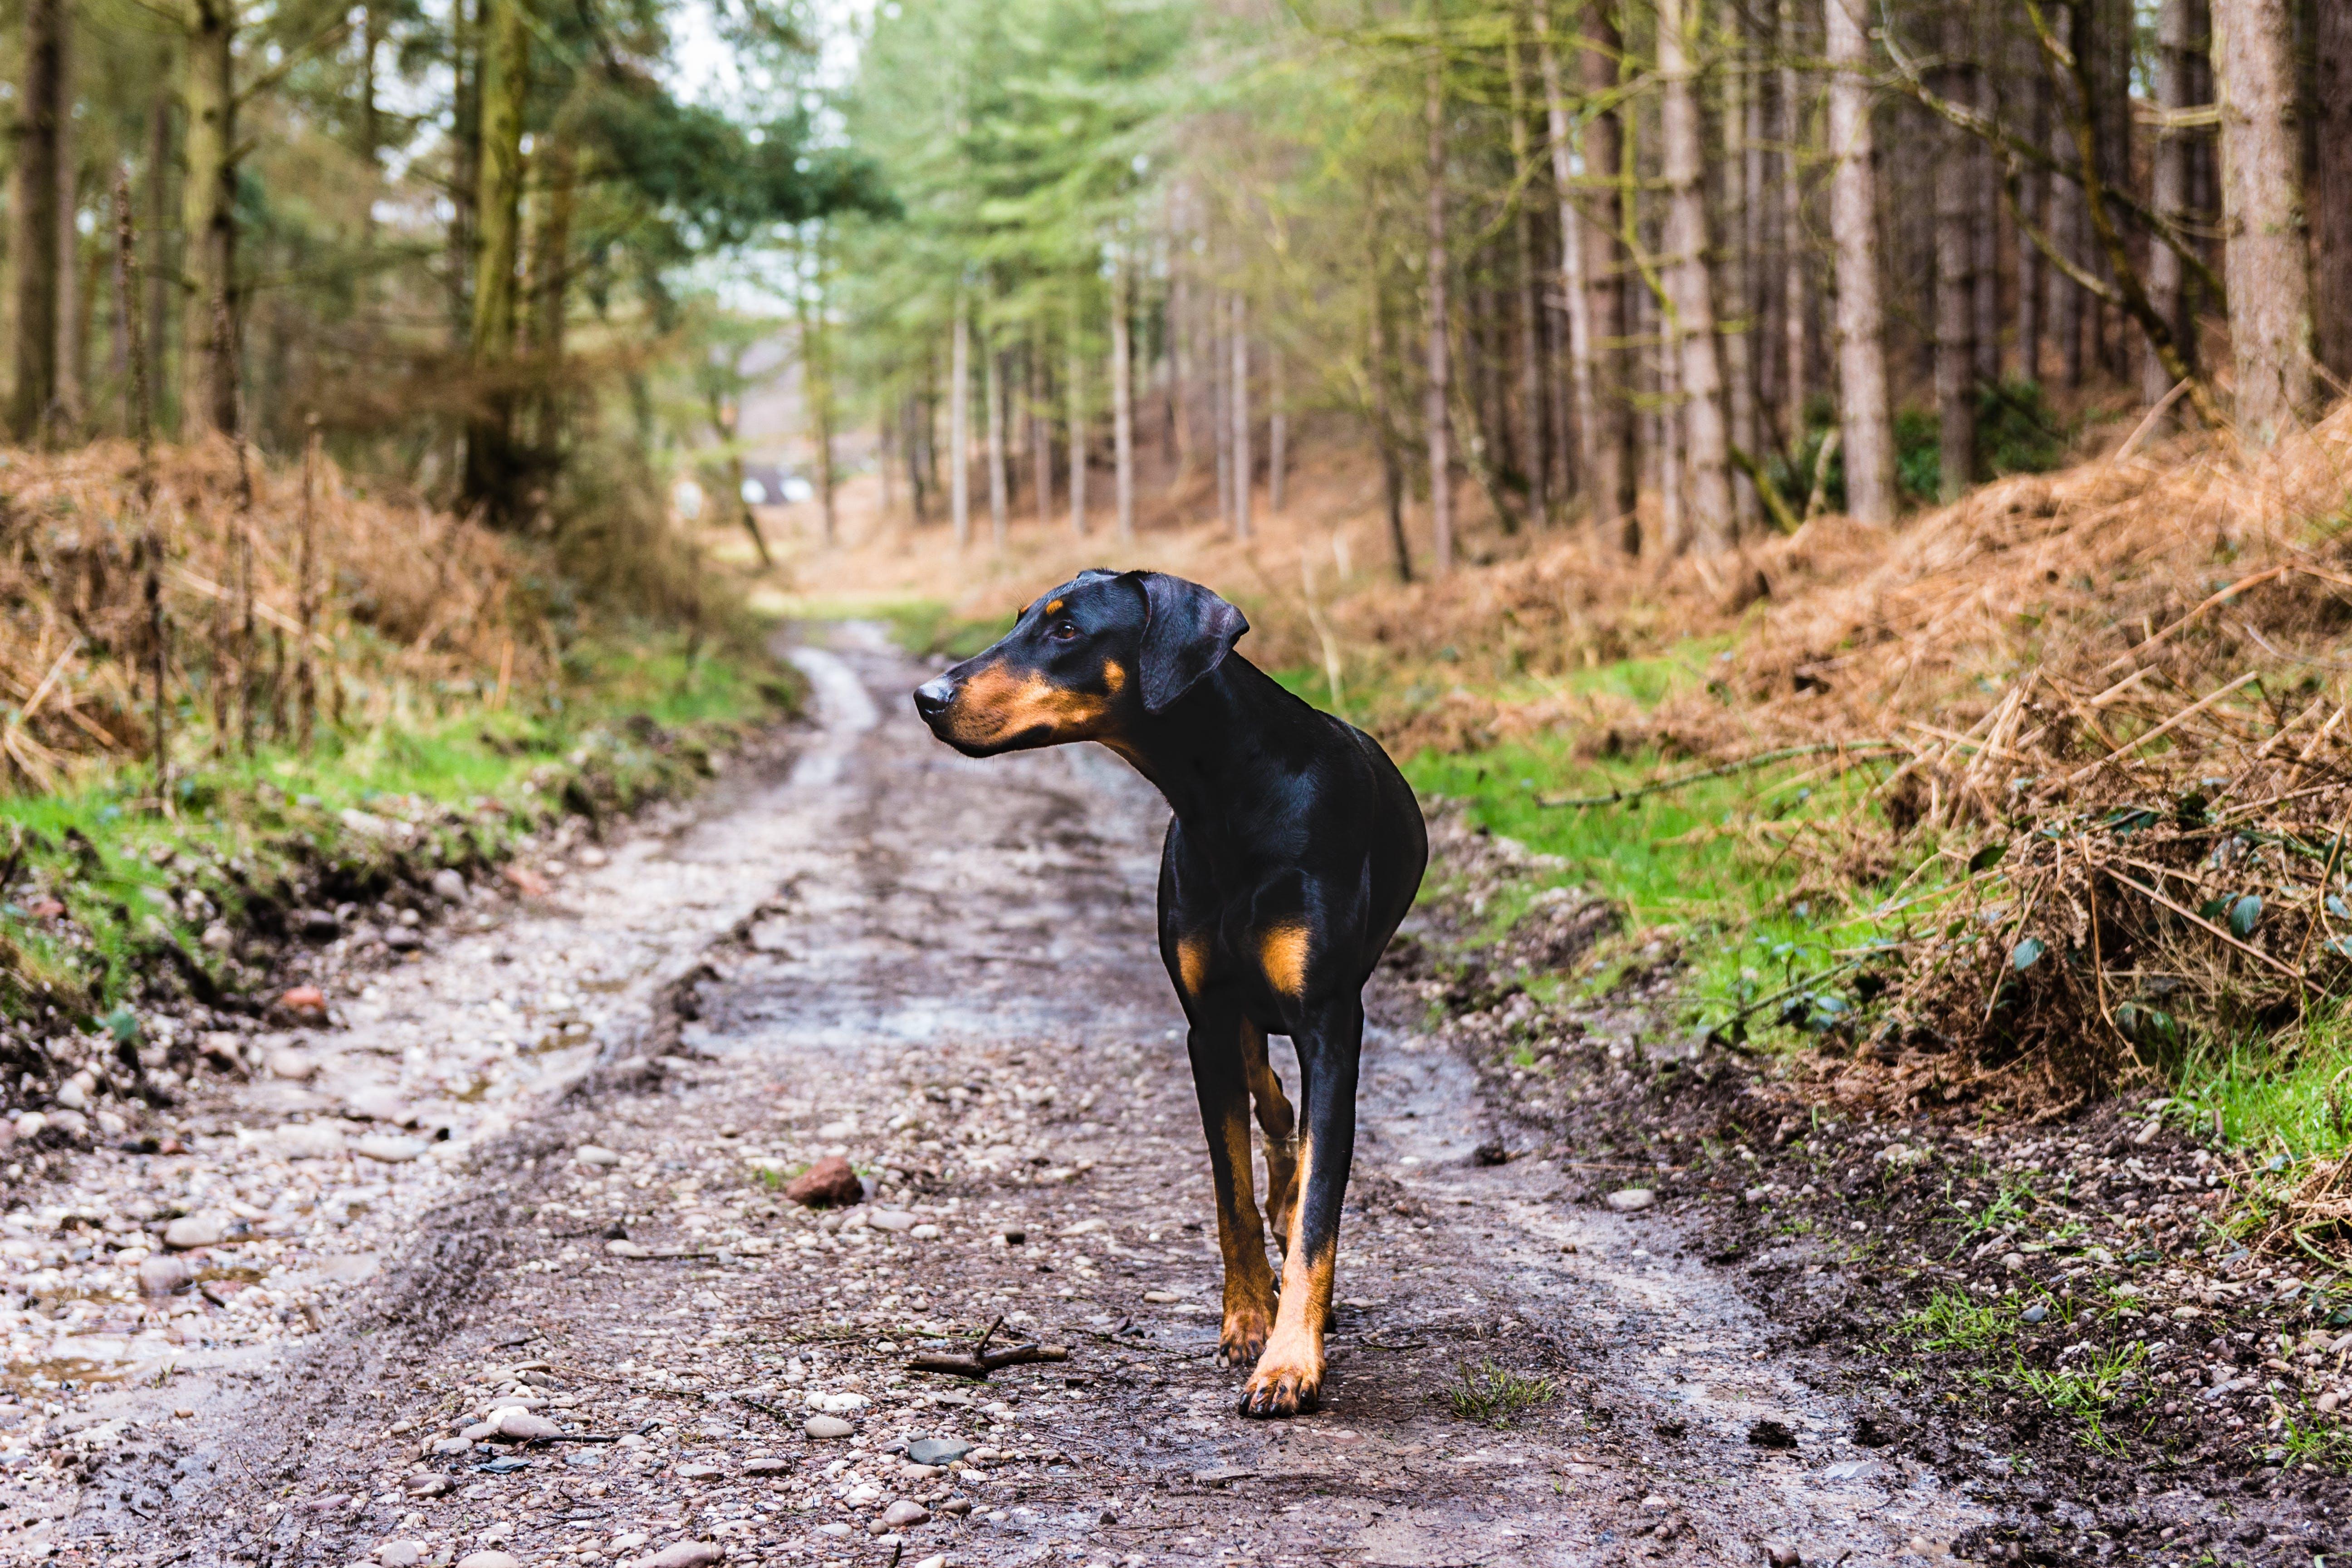 #dog, #dogwalk, #forest